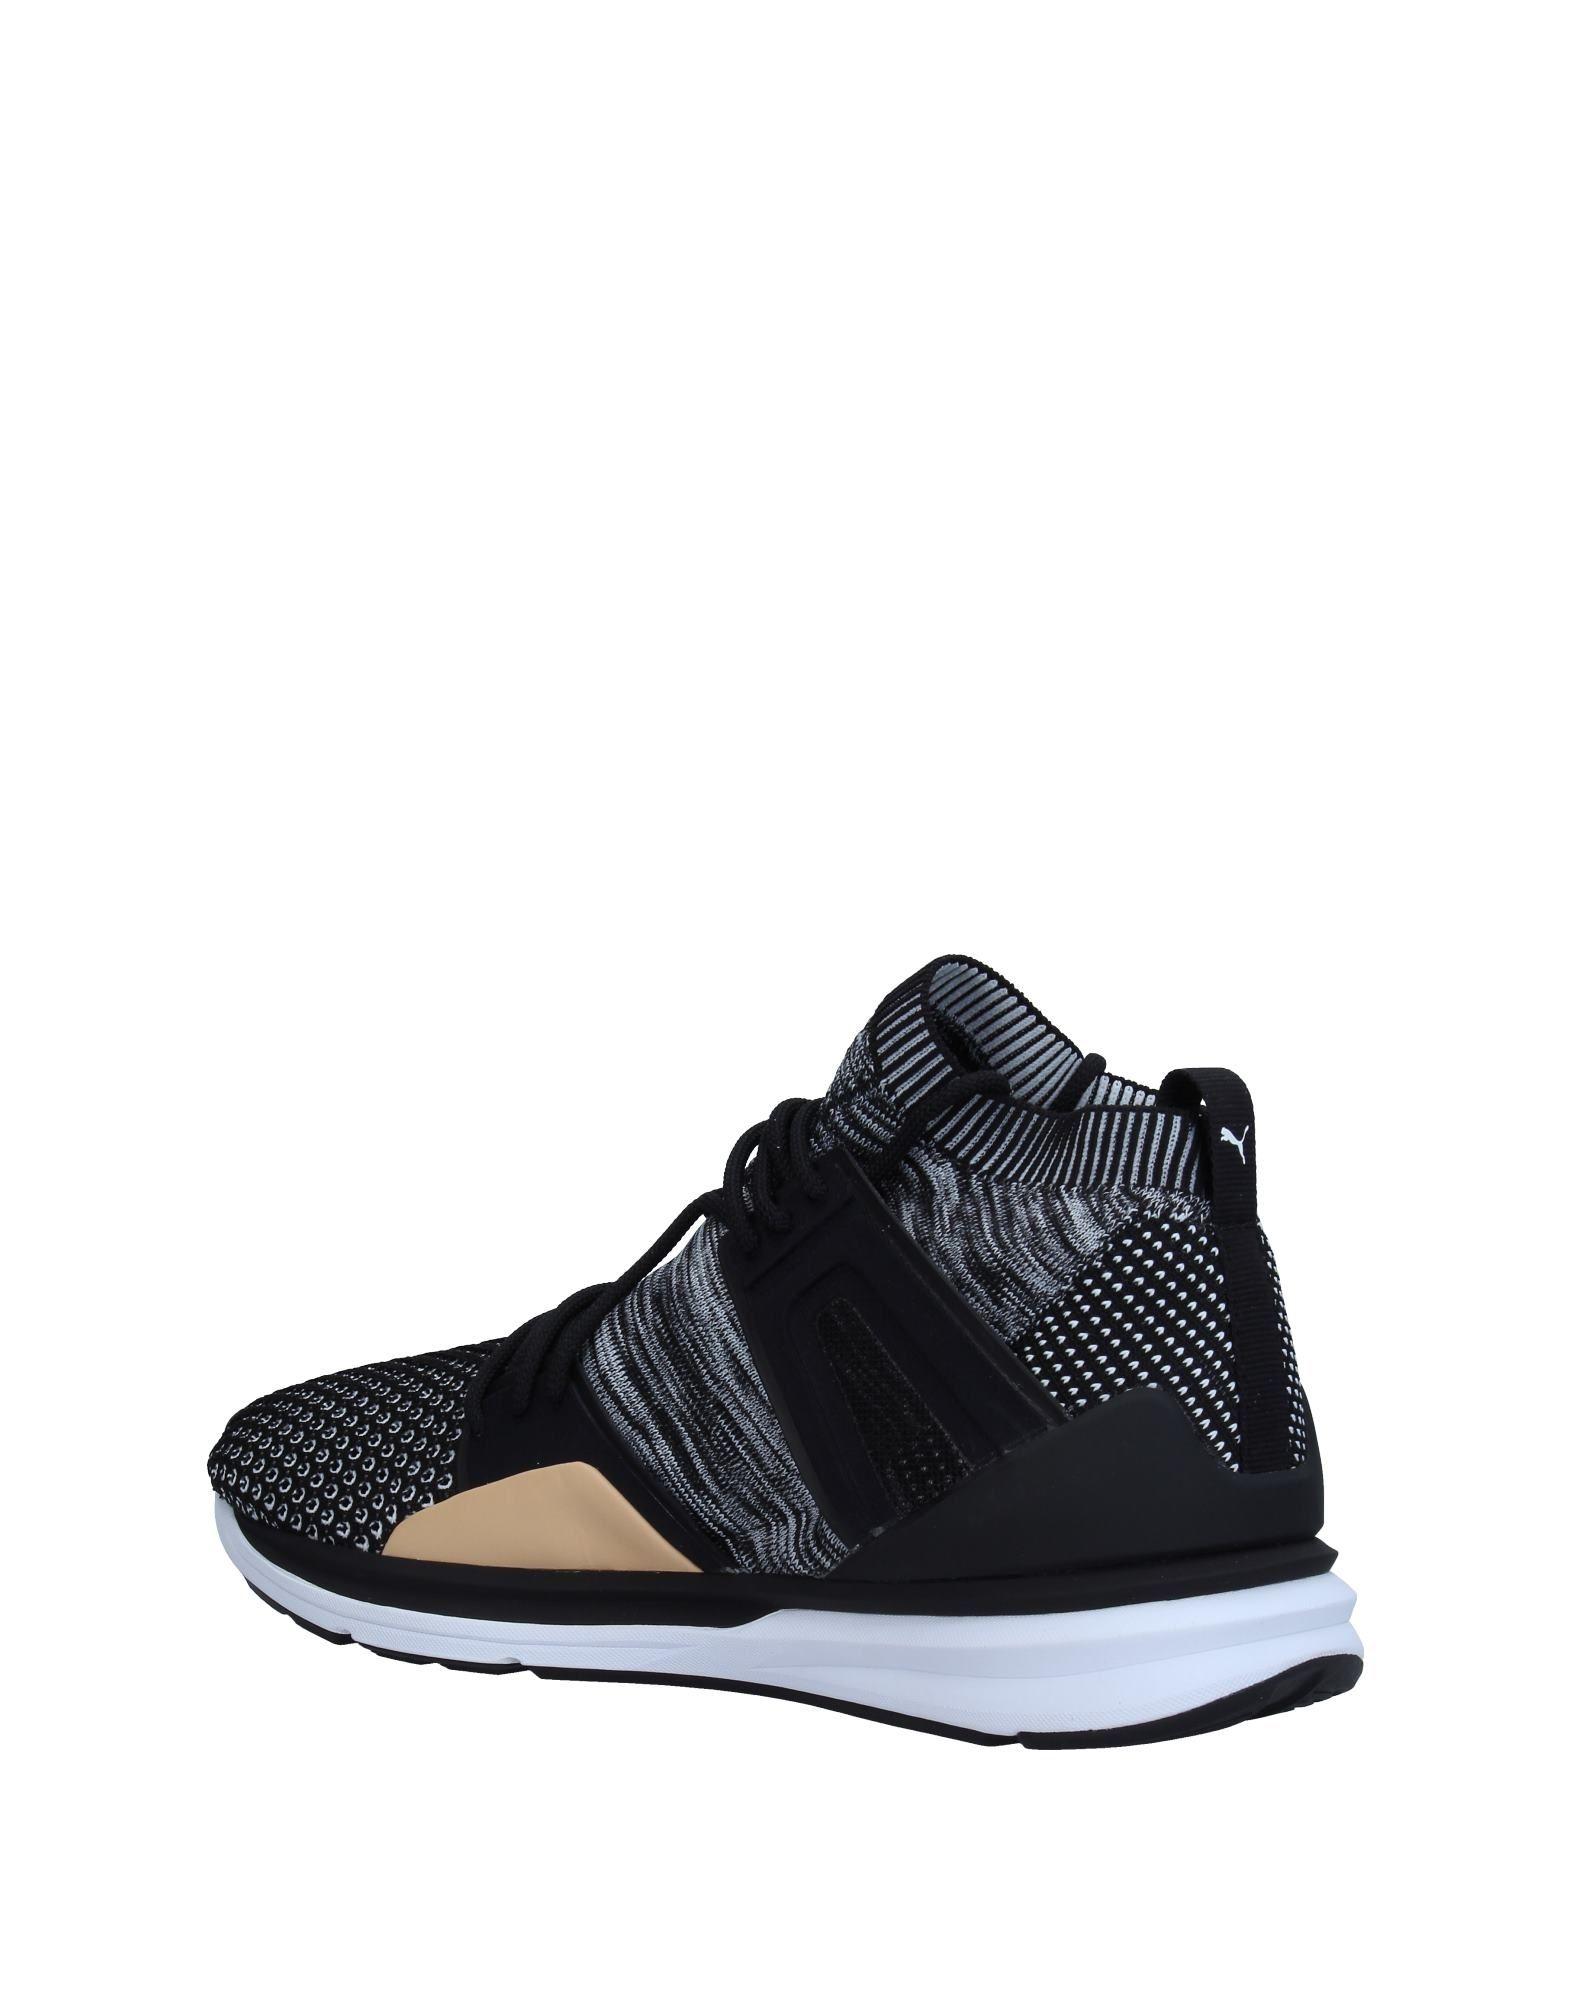 Puma Sneakers - Men Men Men Puma Sneakers online on  Australia - 11333690DM 6dba5a